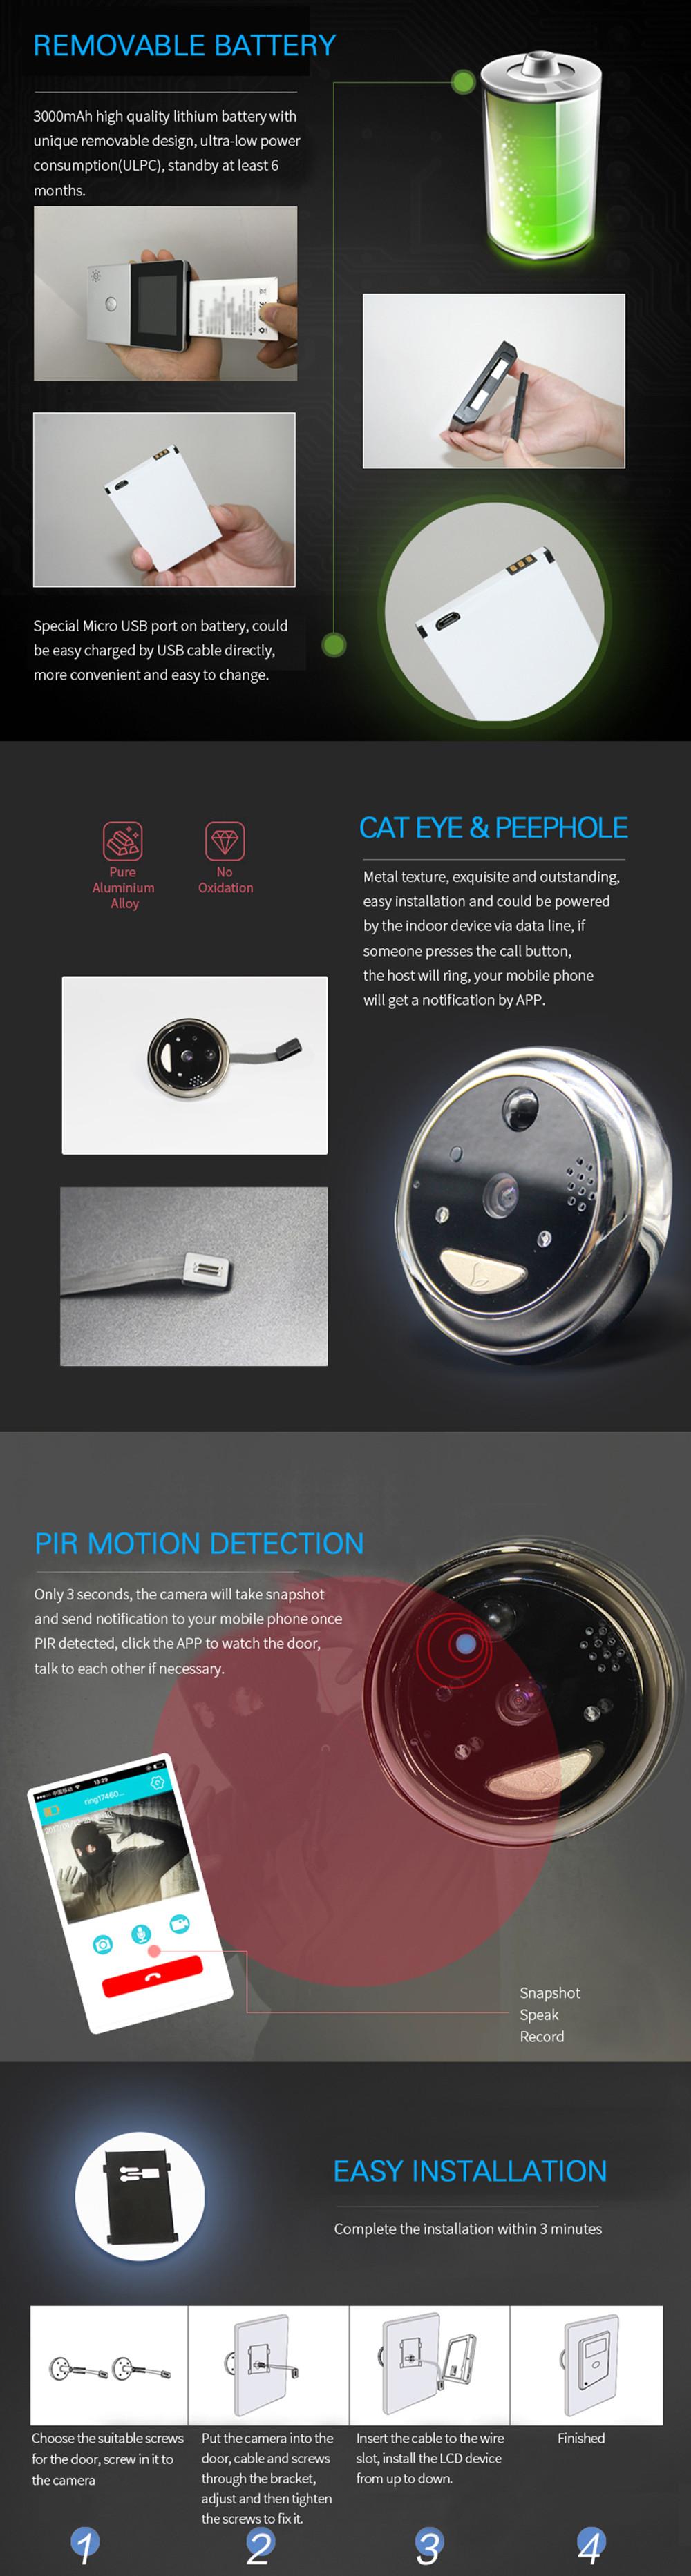 WiFi Peephole Video Doorbell Camera _Cat Eye_details2